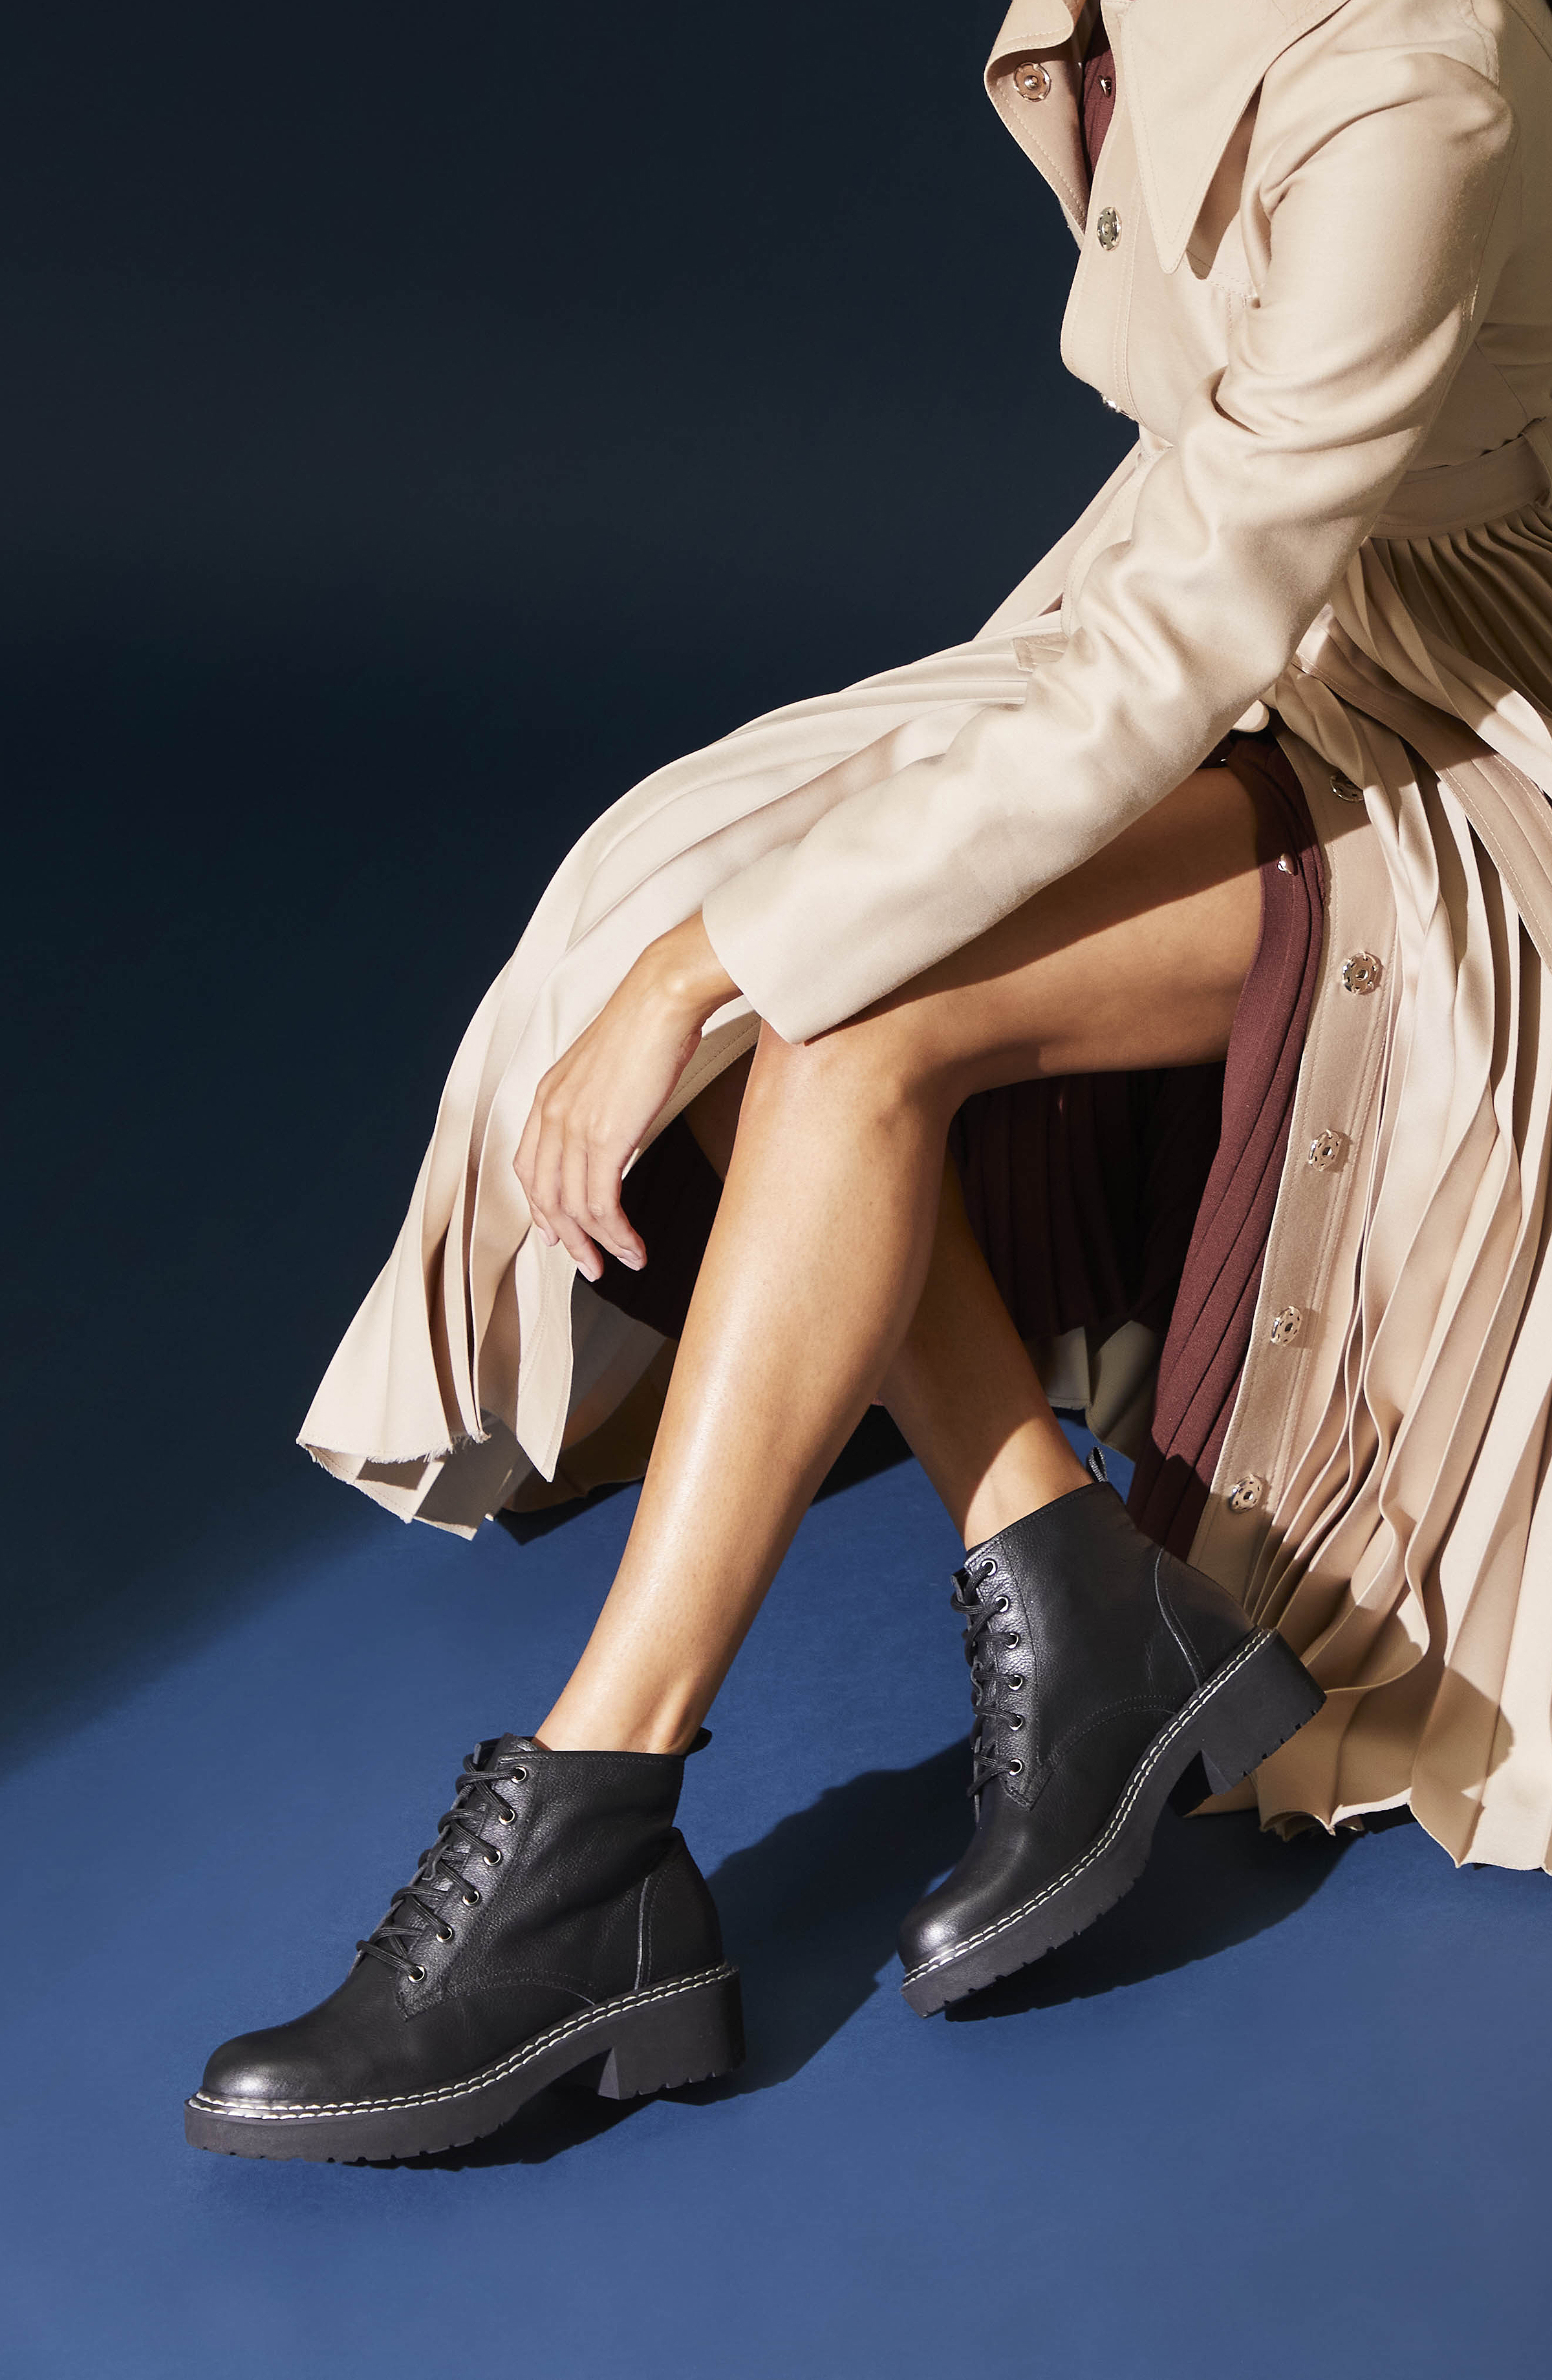 Taylor Women's Lace Up Lug Sole Bootie-Lookbook11